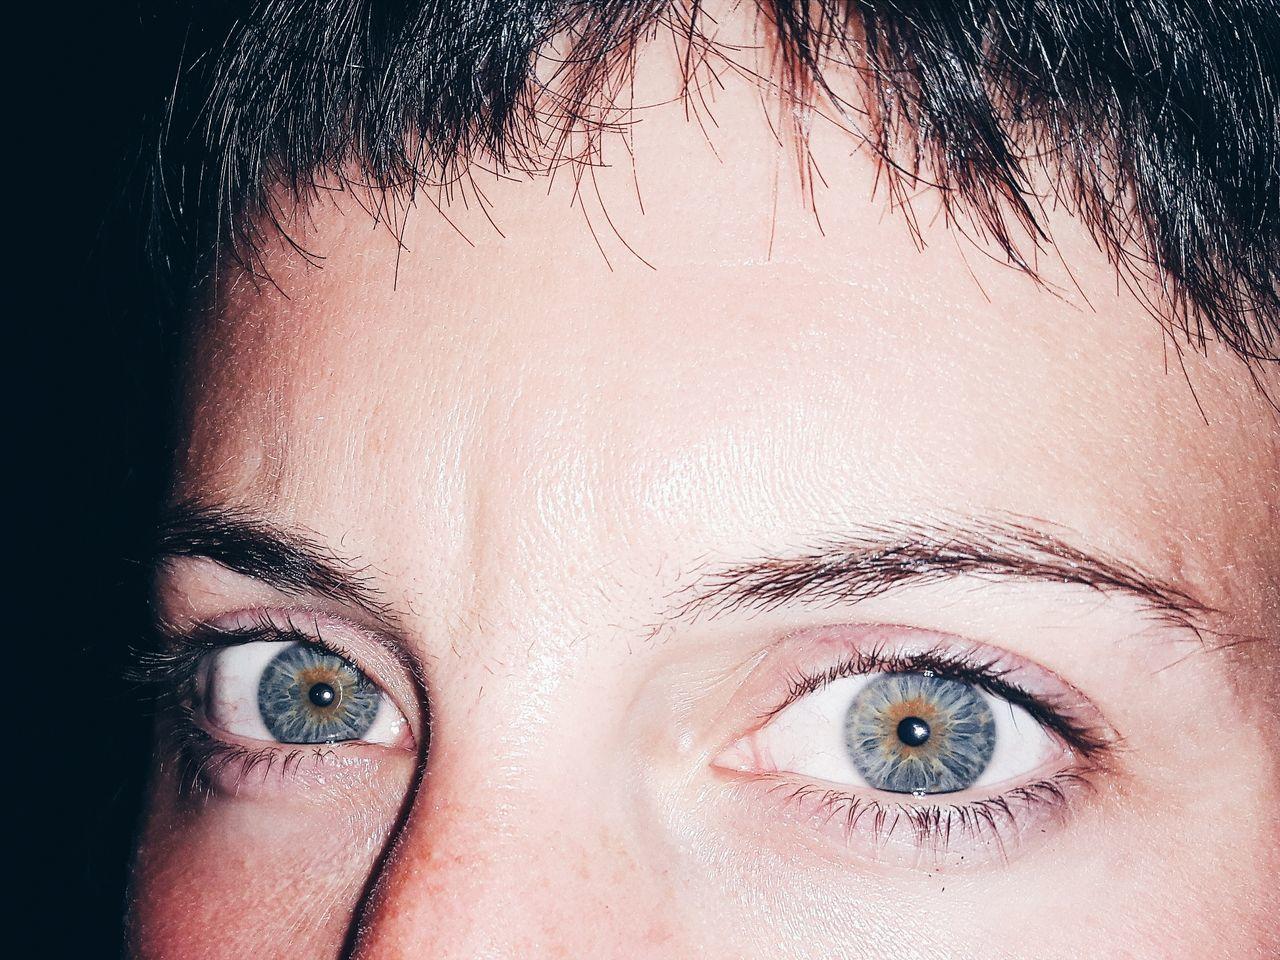 human eye, looking at camera, human body part, real people, portrait